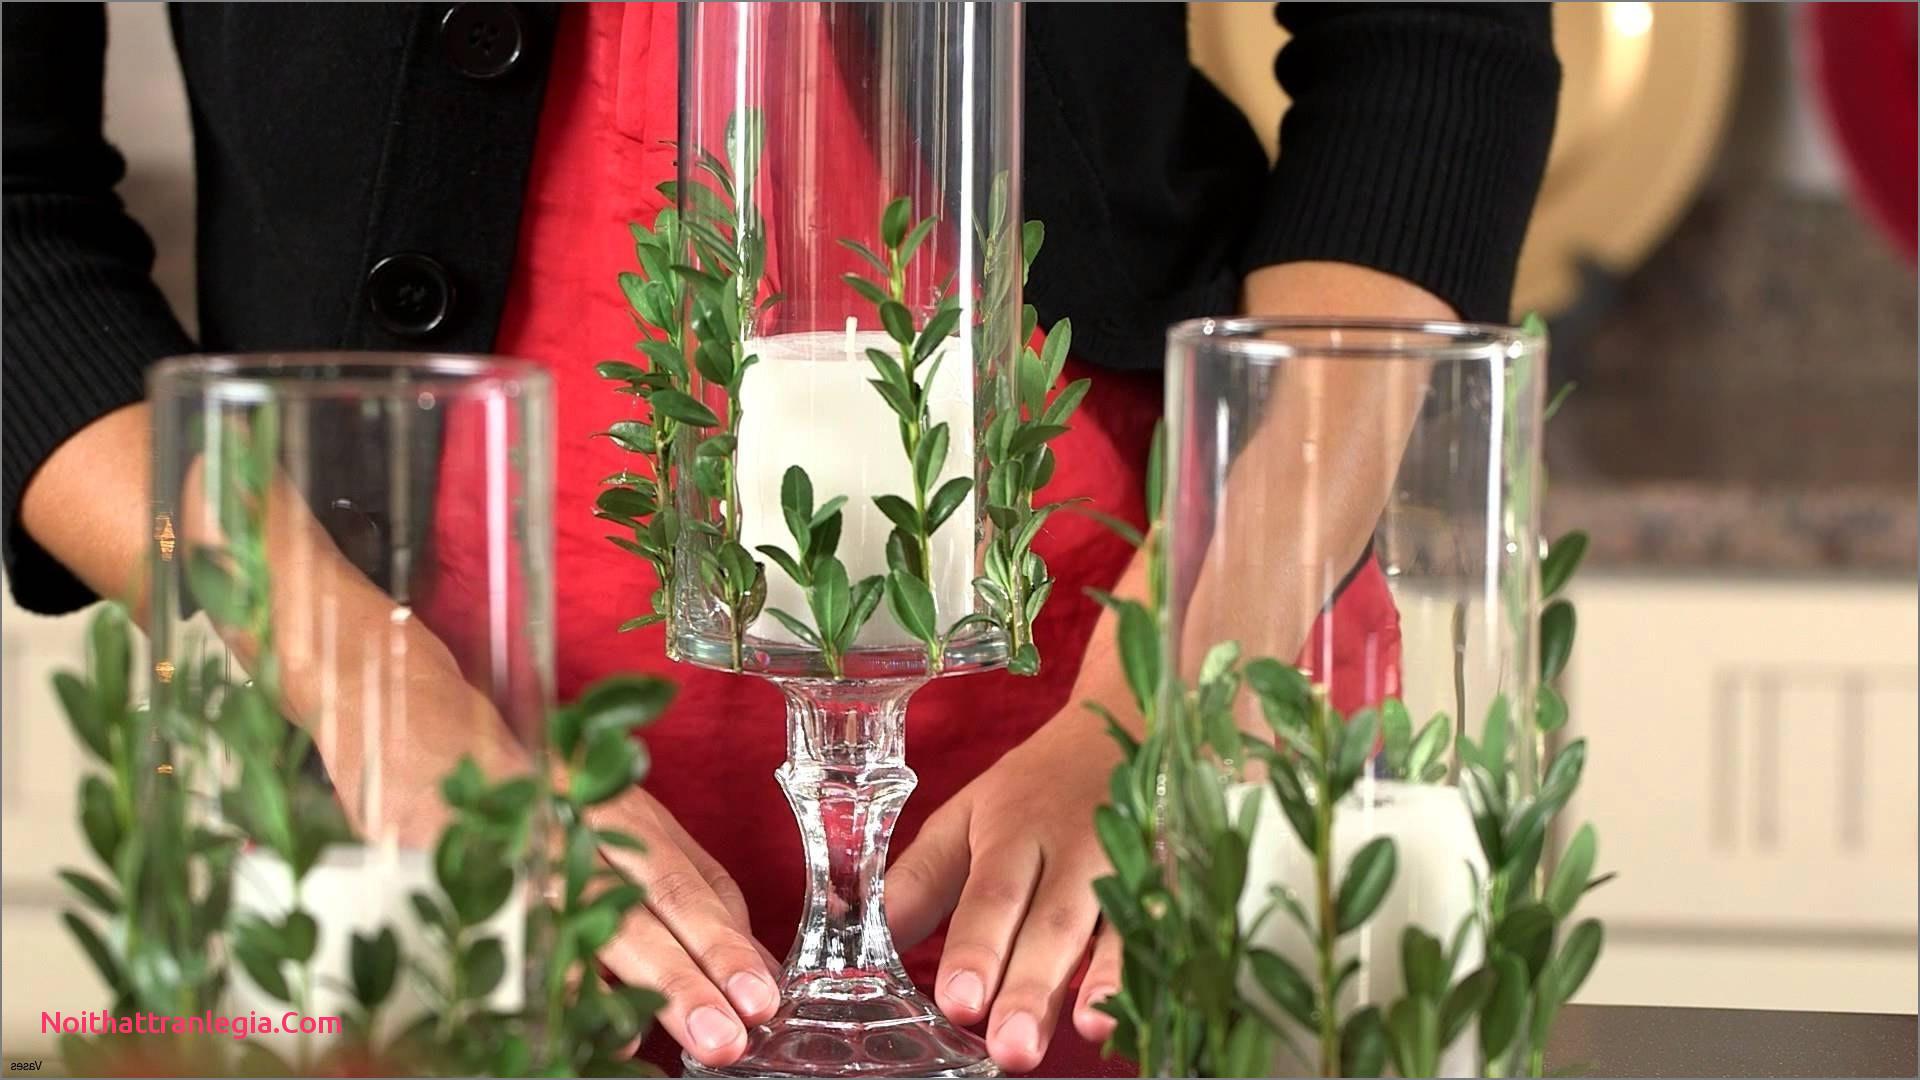 rectangular glass vases bulk of 20 wedding vases noithattranlegia vases design for wedding centerpiece decoration ideas unique dollar tree wedding decorations awesome h vases dollar vase i 0d